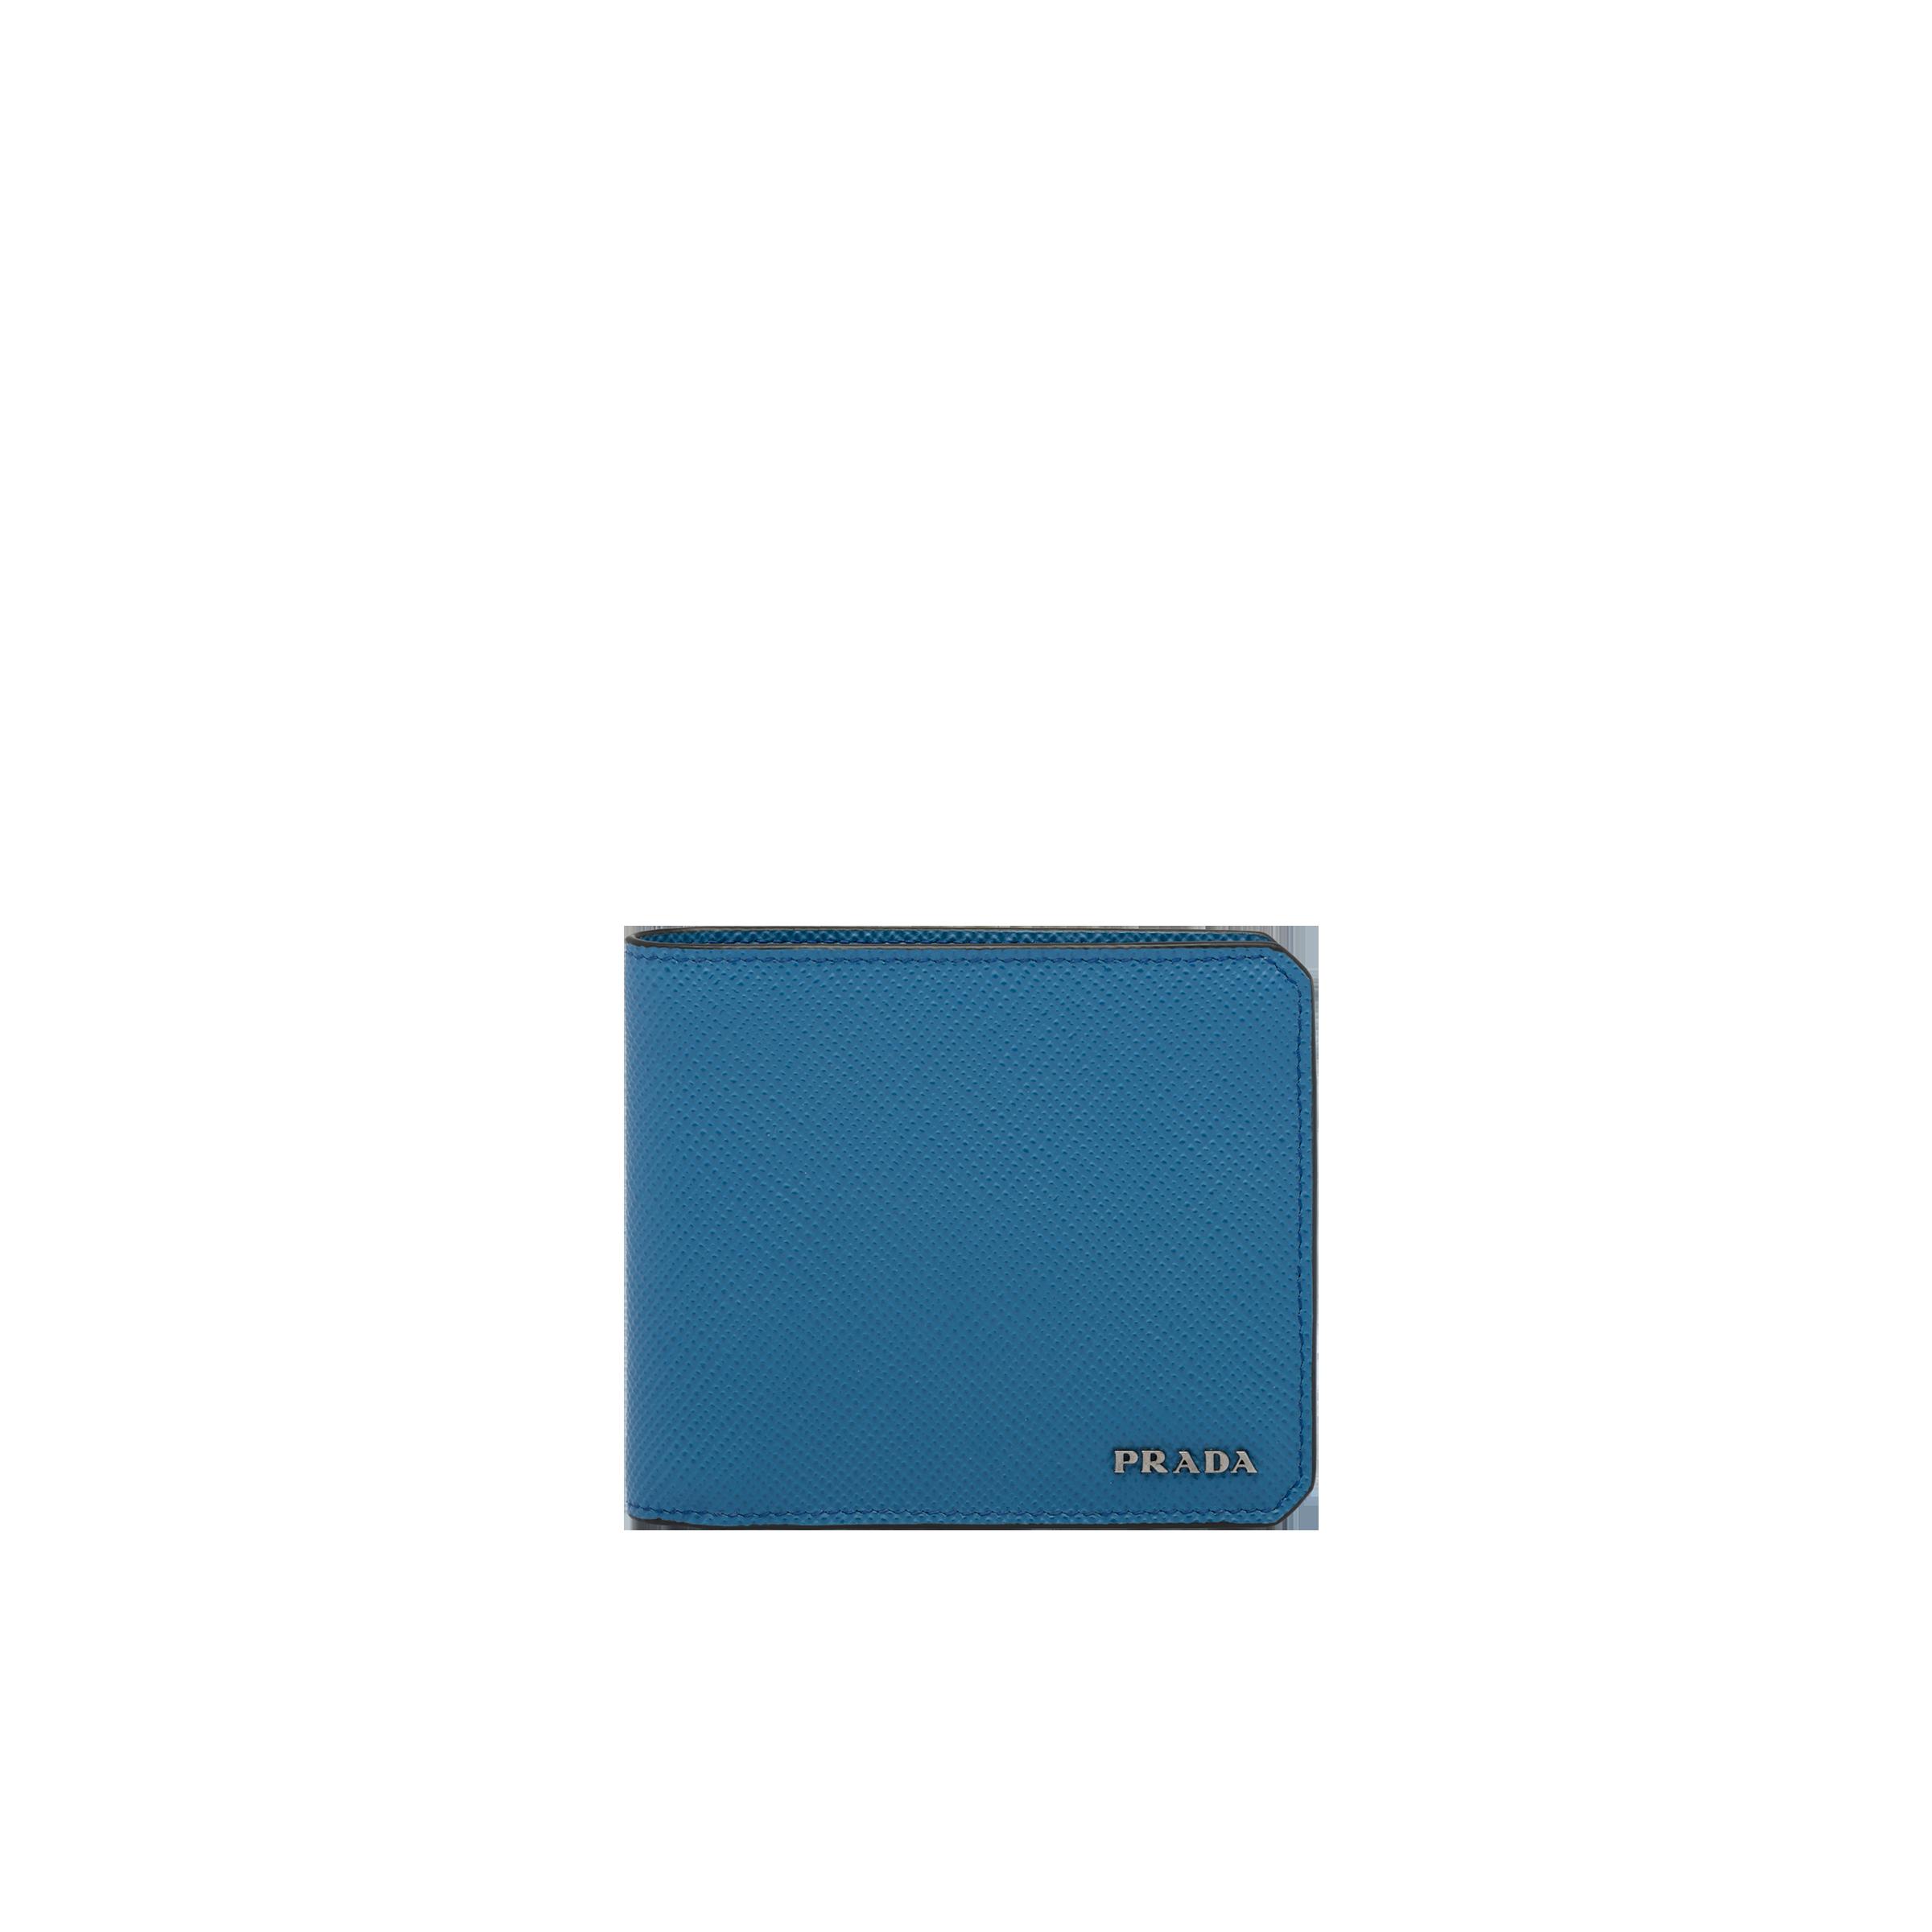 668e6f9fa915 Men's Wallets | Prada